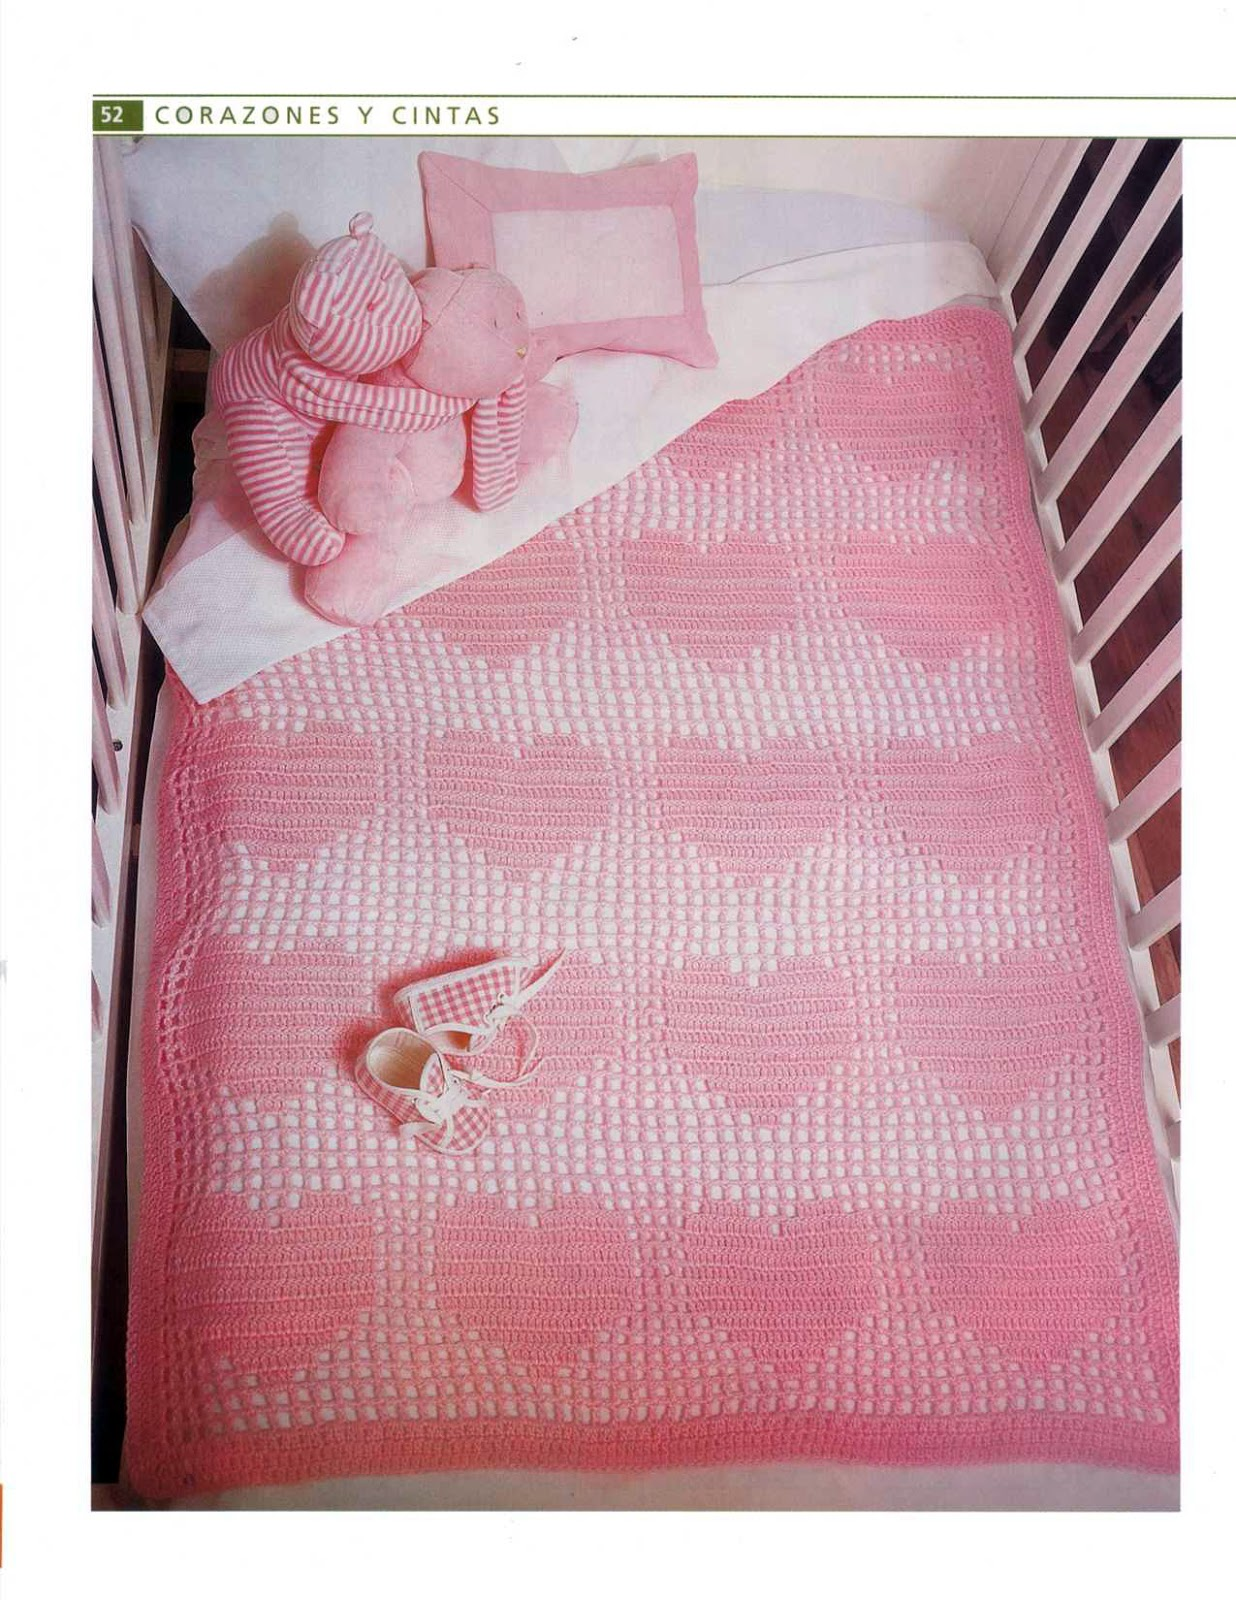 Crochet Bedspread Patterns Part 16 Beautiful Crochet Patterns And